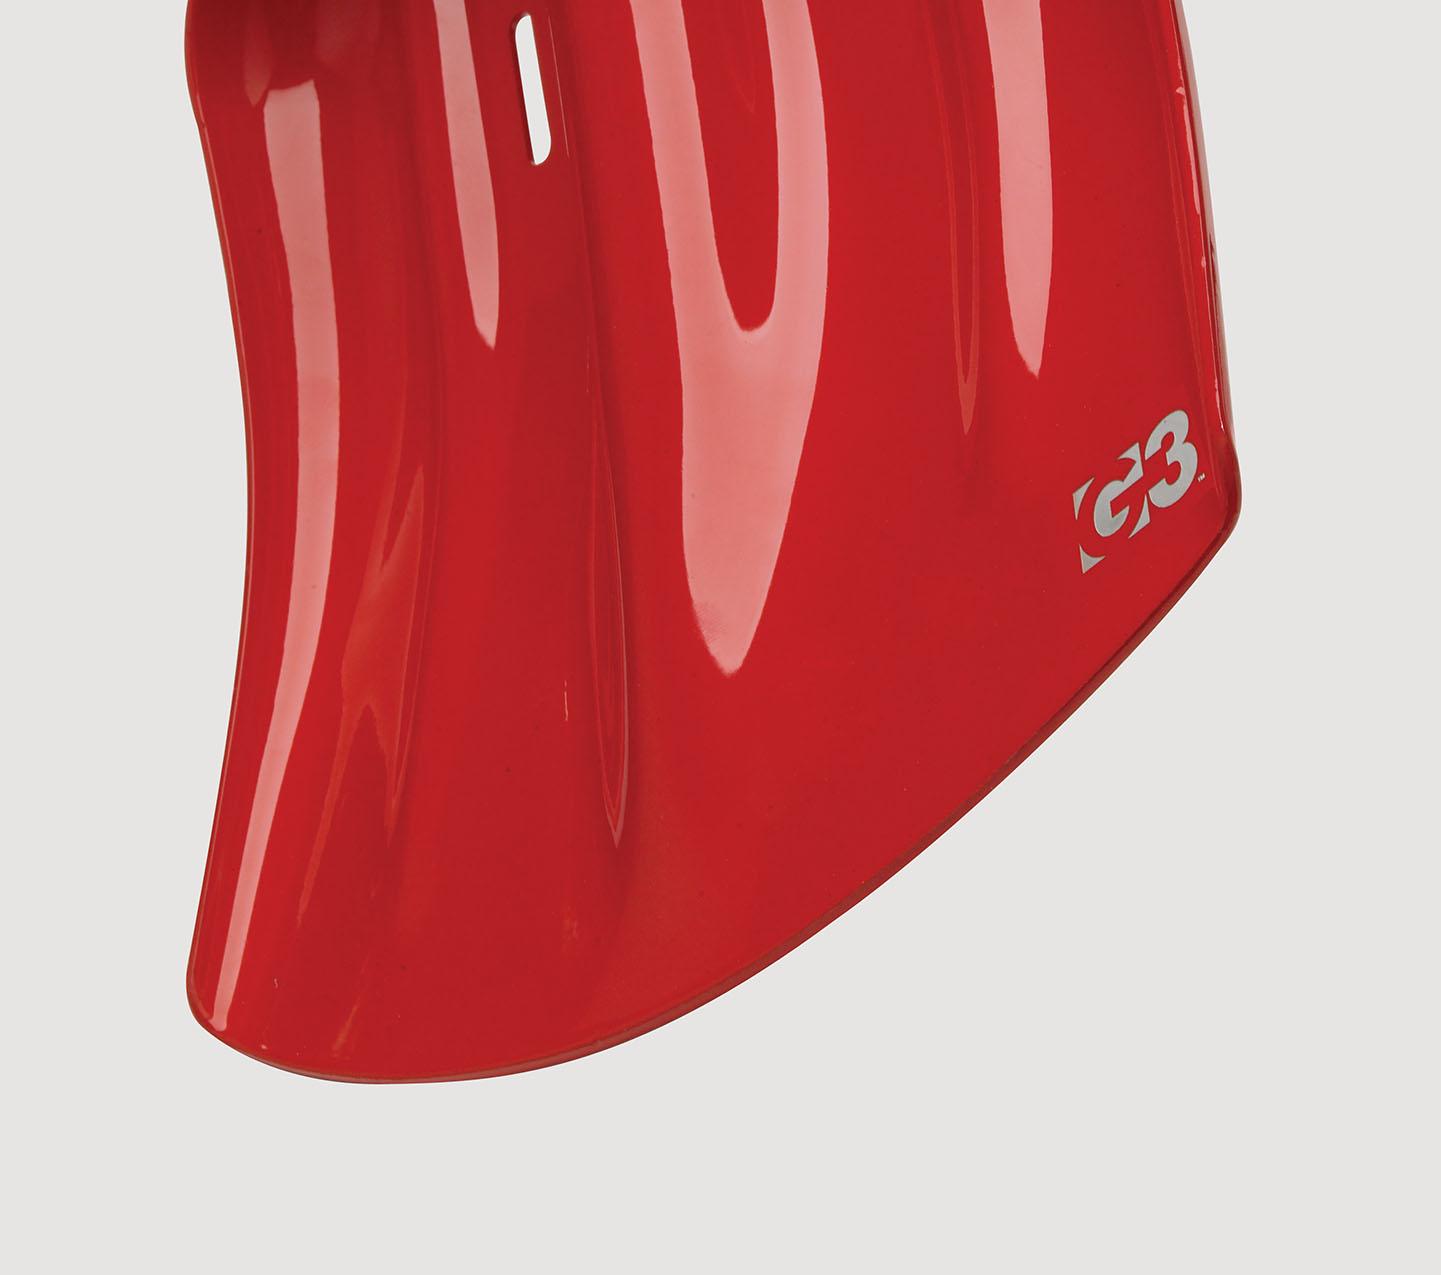 G3 Sports equipment -